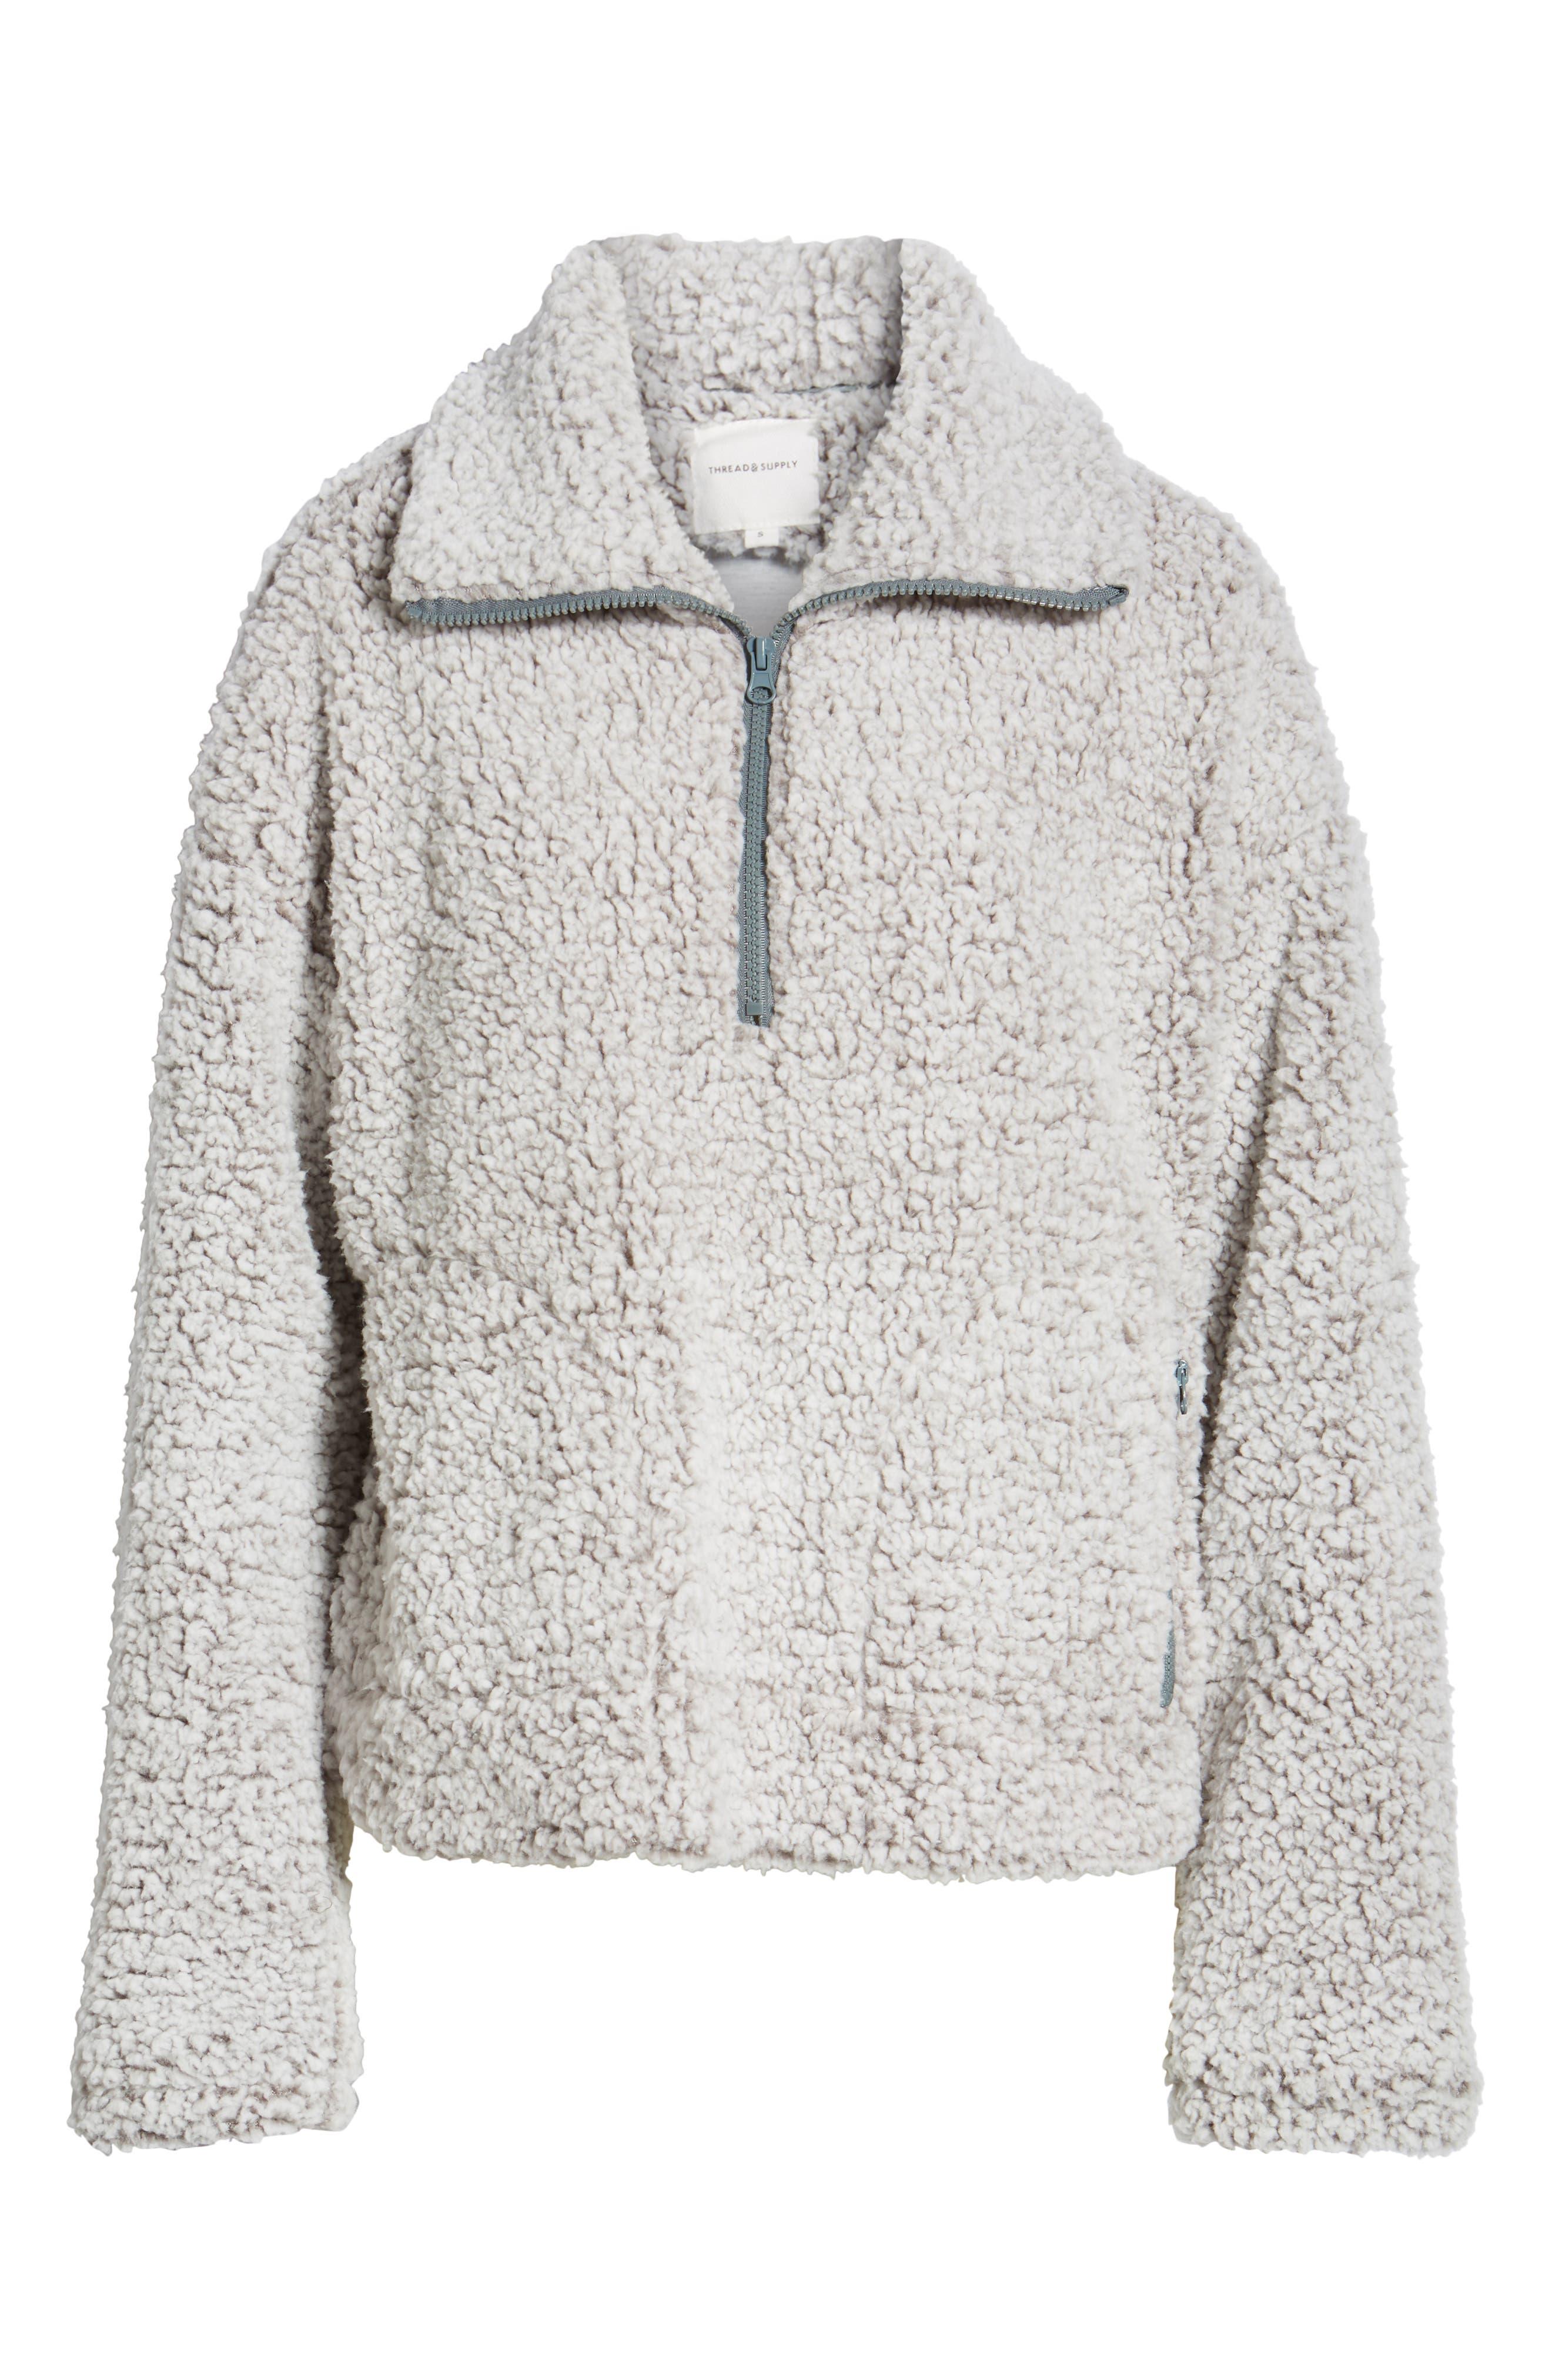 THREAD & SUPPLY, Quarter Zip Fleece Pullover, Alternate thumbnail 6, color, SILVER